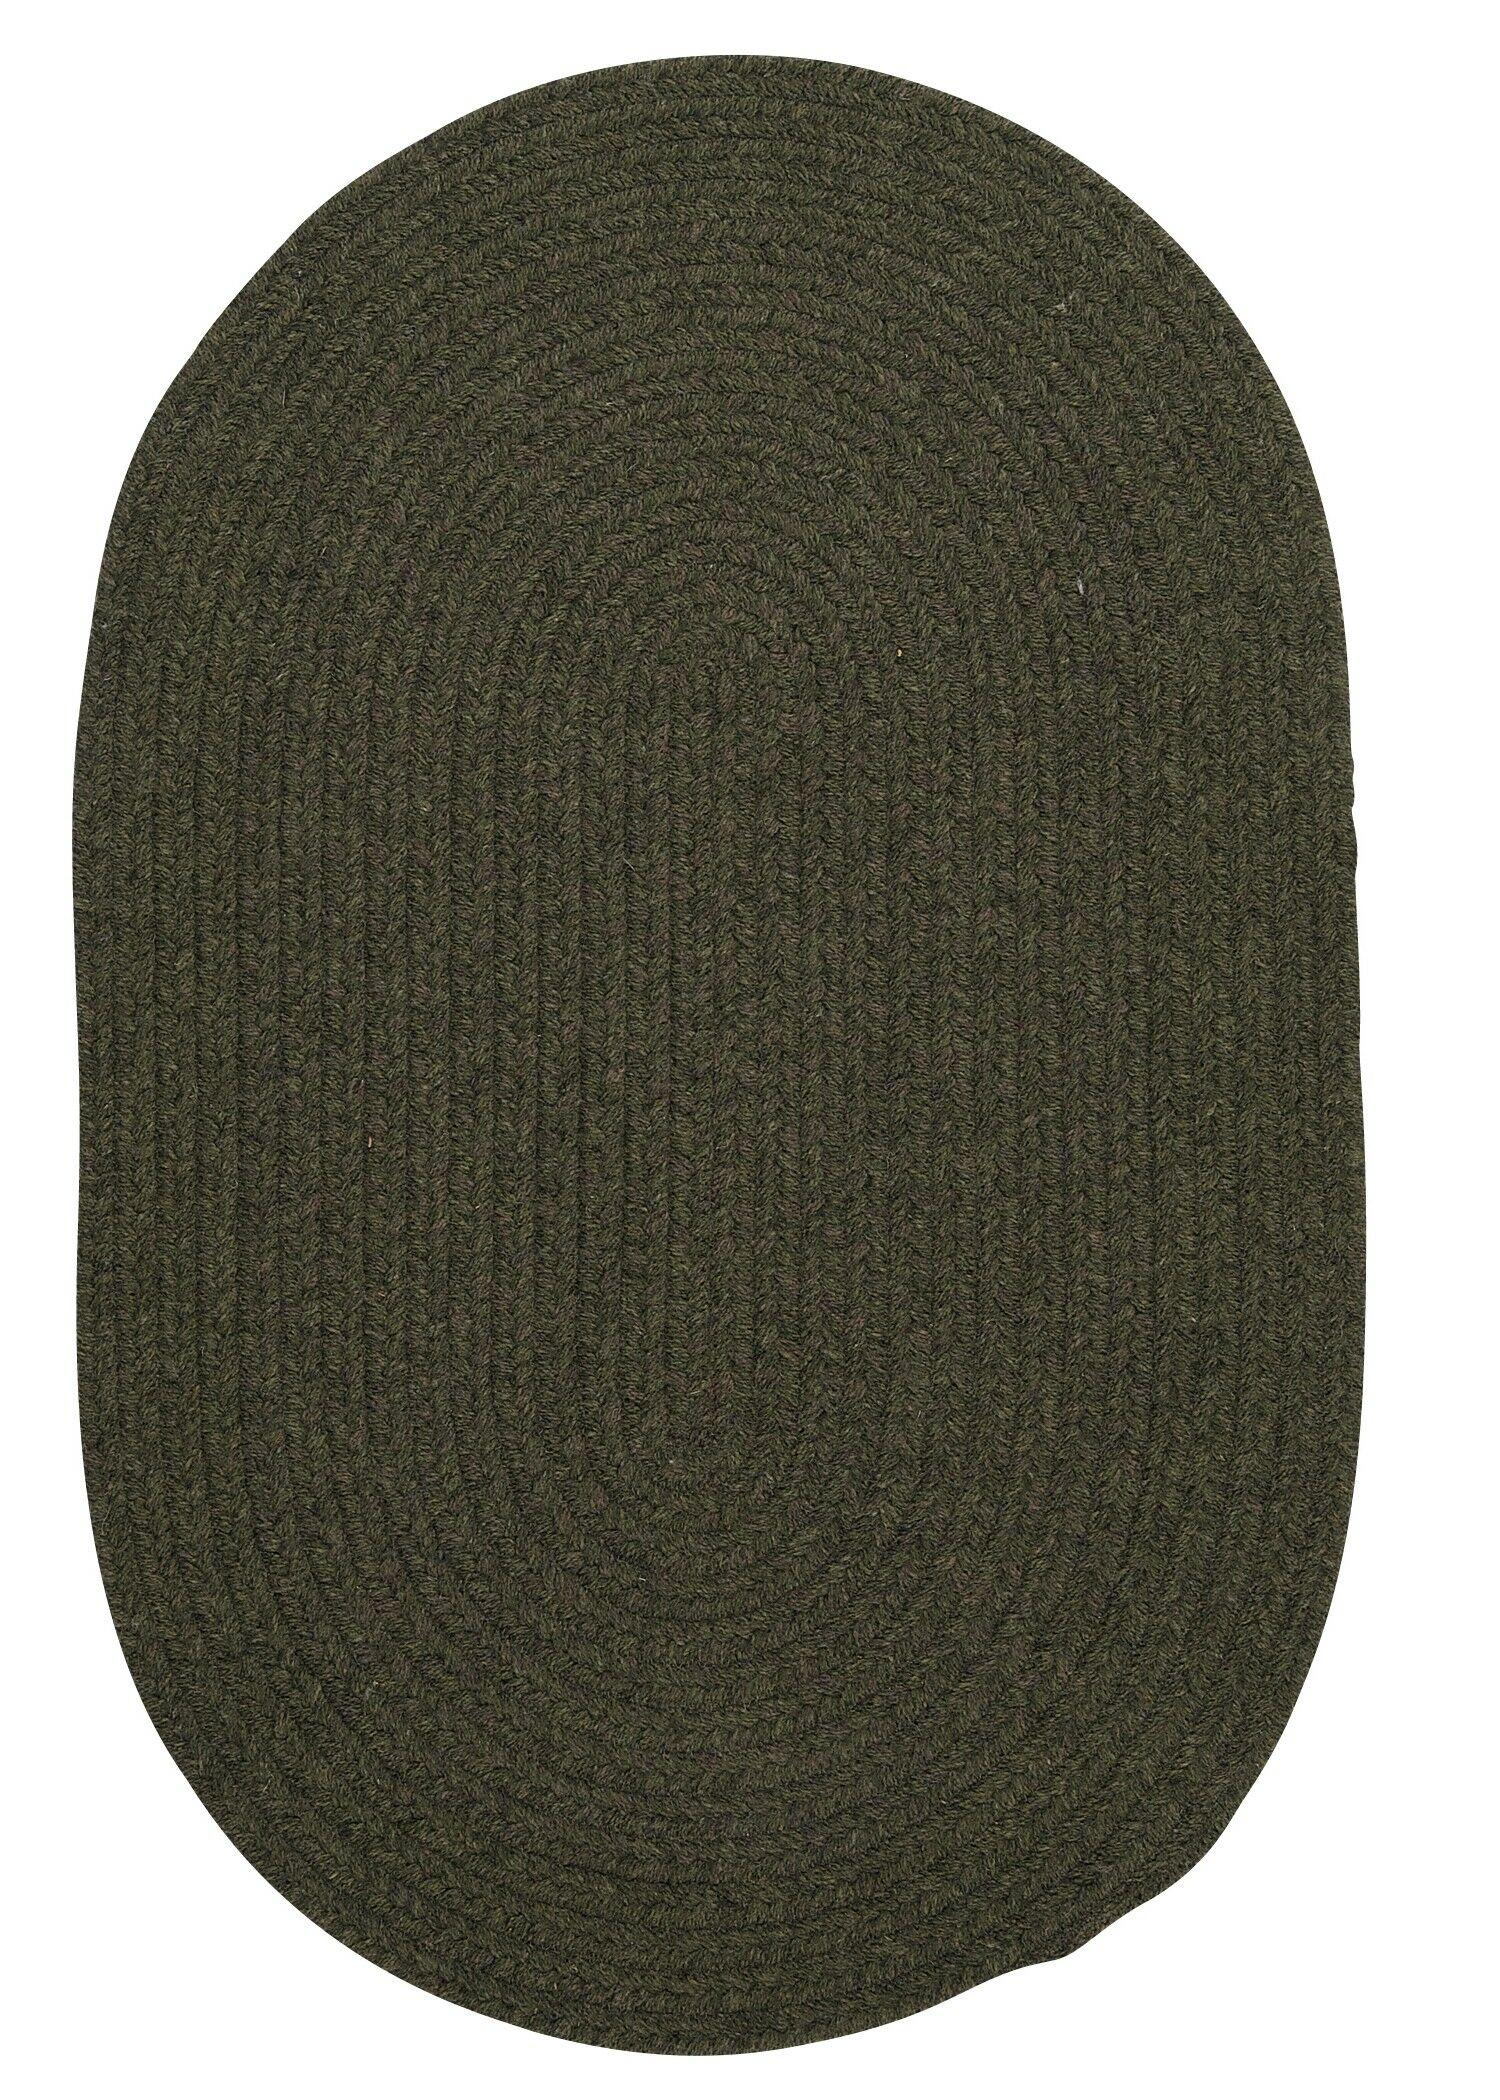 Navarrette Olive Area Rug Rug Size: Round 12'